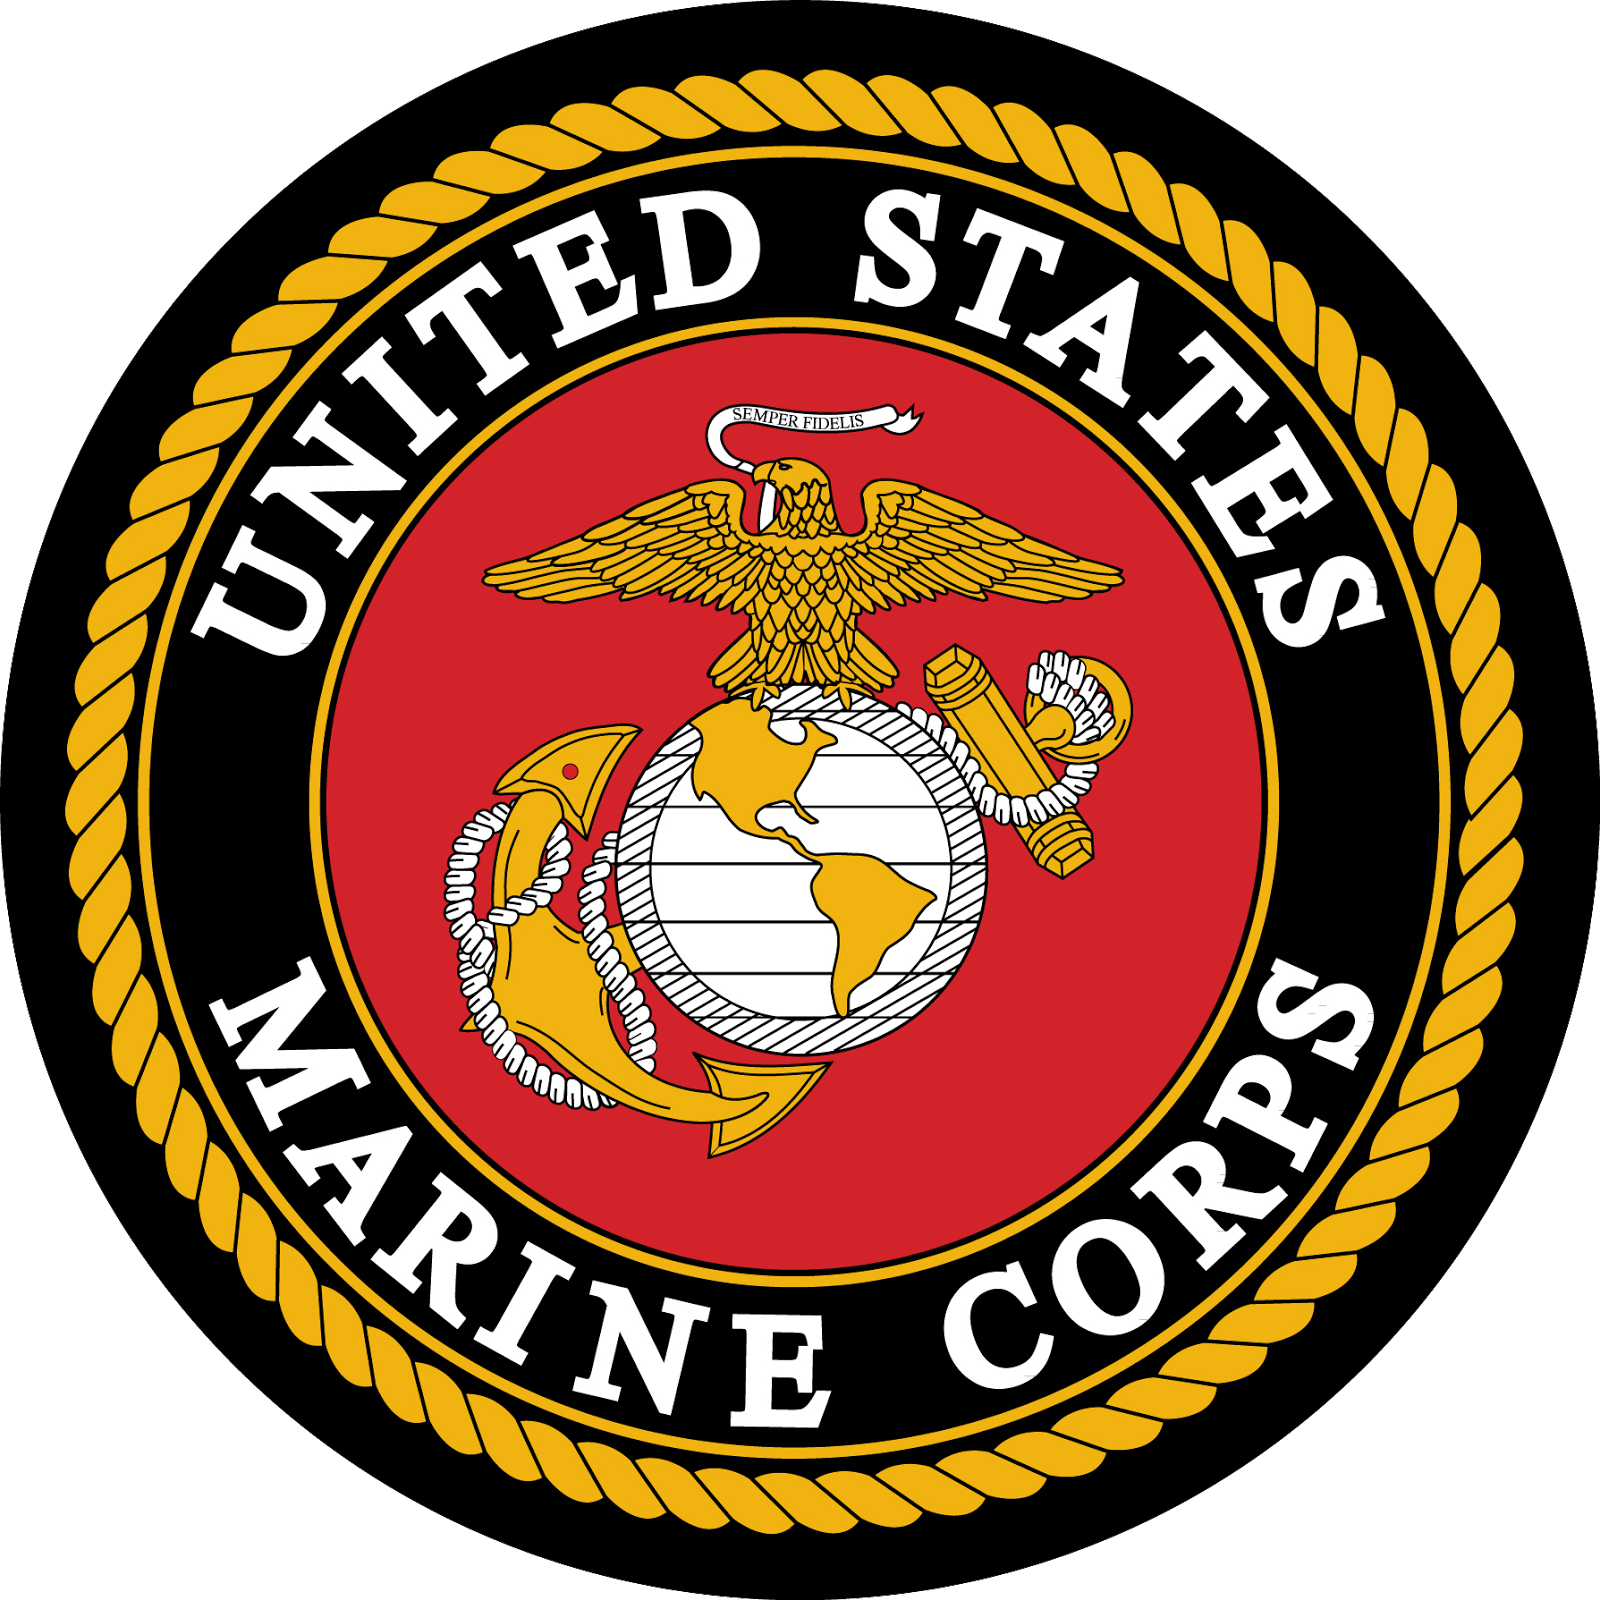 Fac USMC